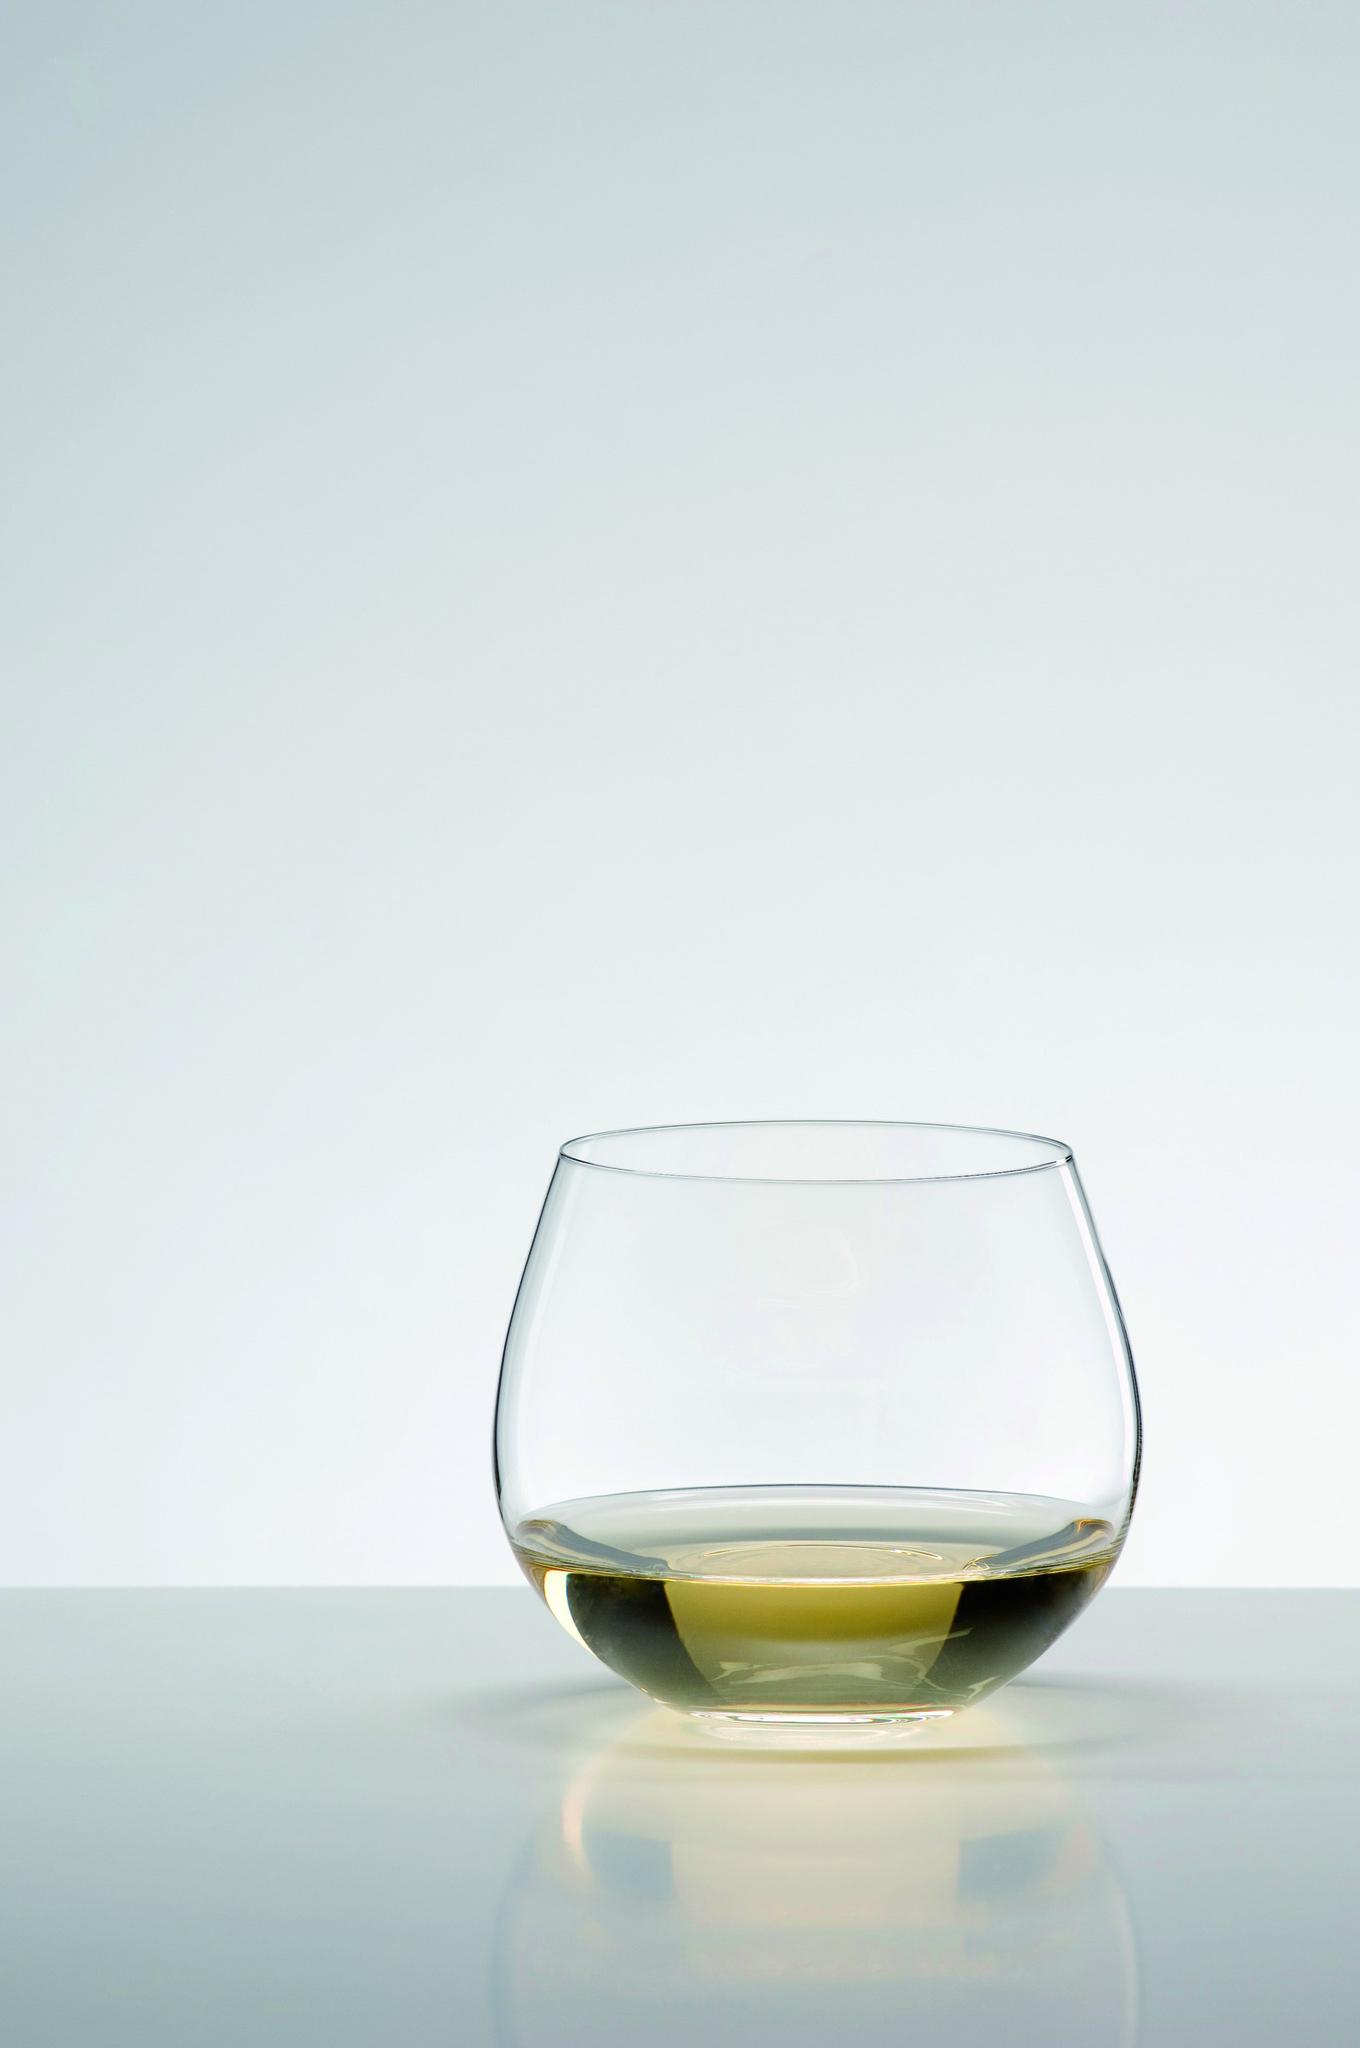 Бокалы Набор бокалов для белого вина 2шт 580мл Riedel The O Wine Tumbler Chardonnay nabor-bokalov-dlya-belogo-vina-2-sht-580-ml-riedel-the-o-wine-tumbler-chardonnay-avstriya.jpg